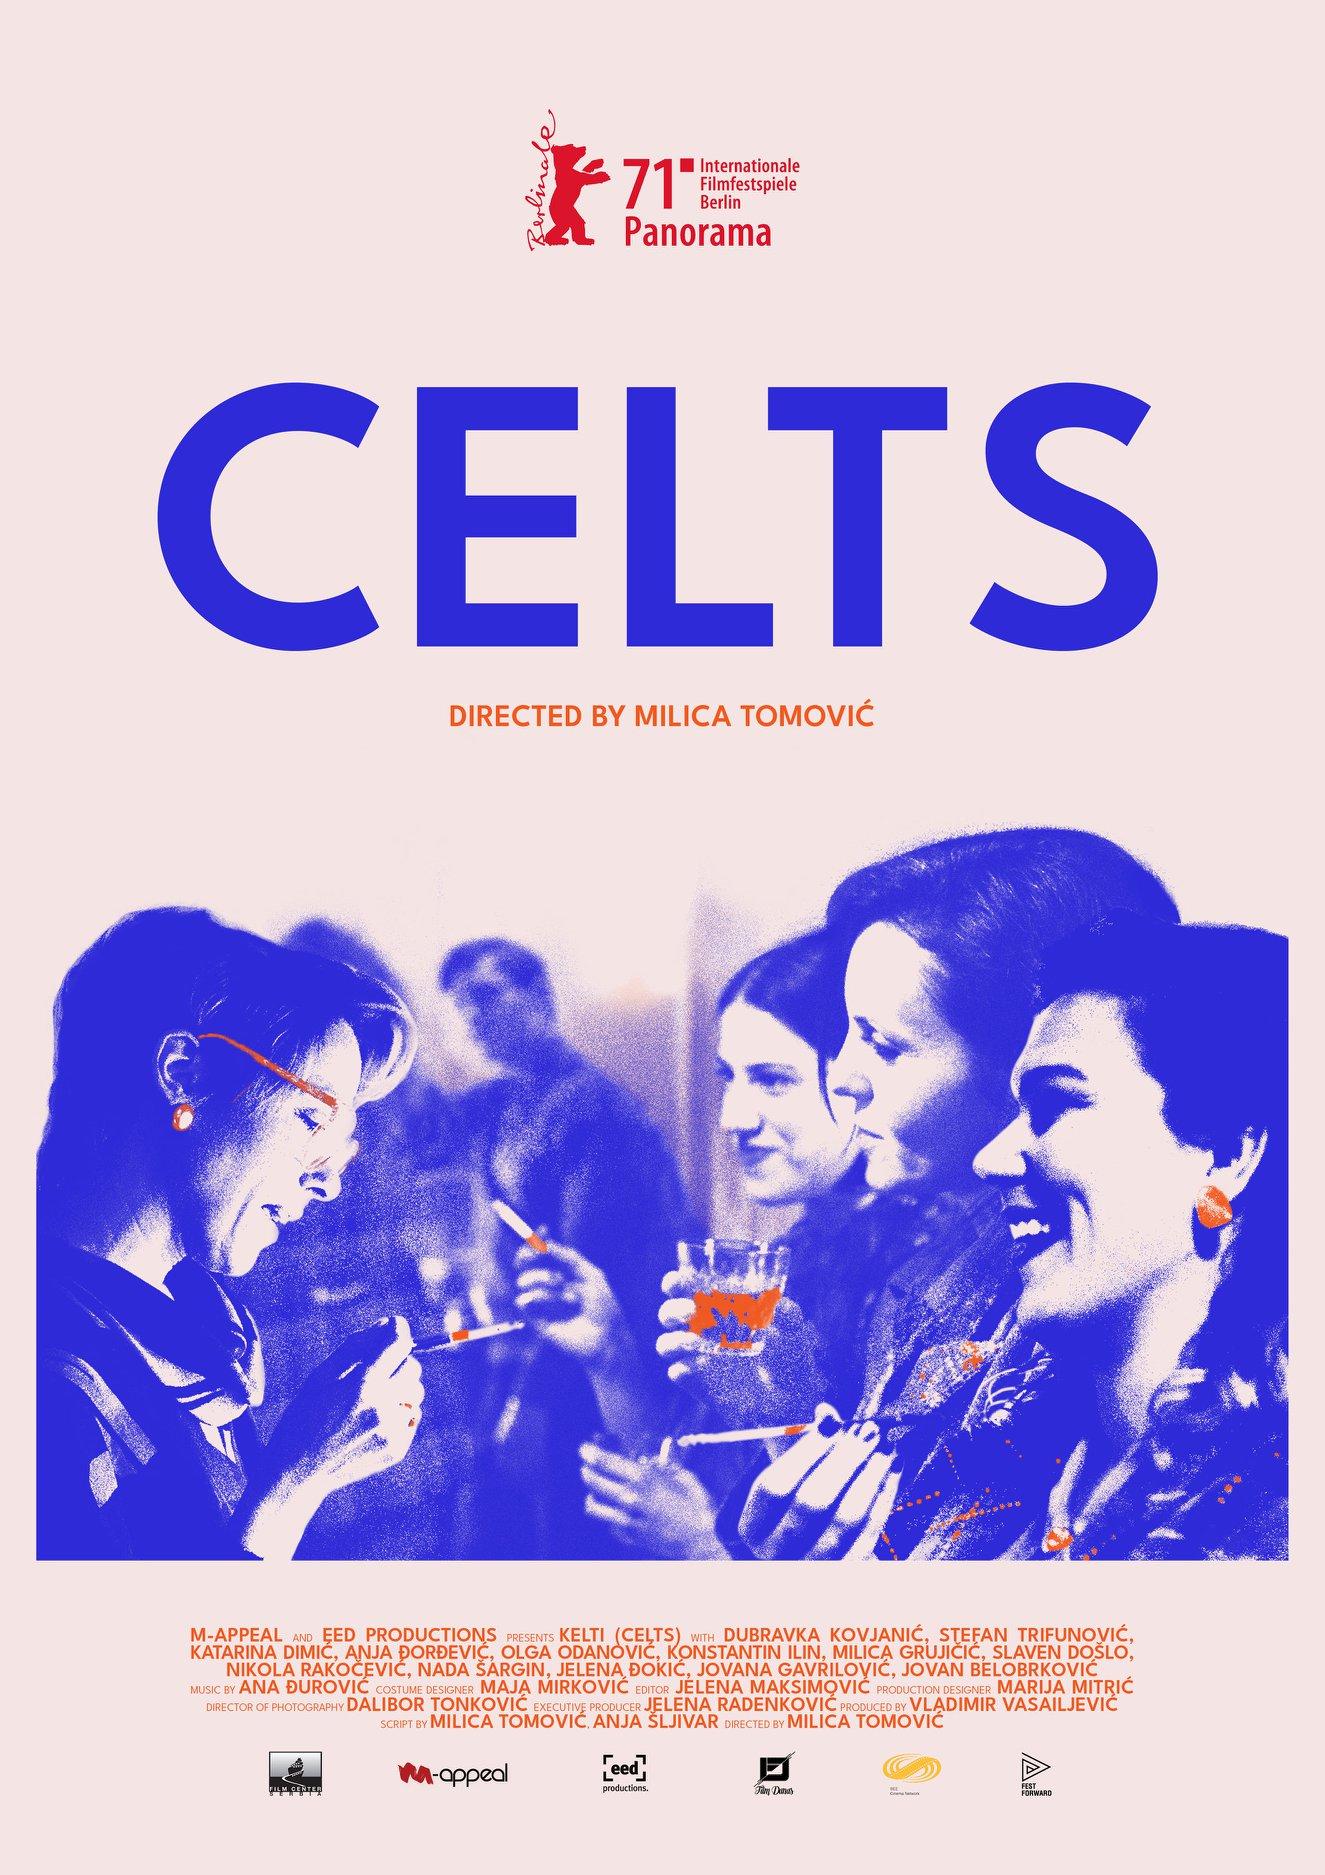 Download Filme Celta Qualidade Hd